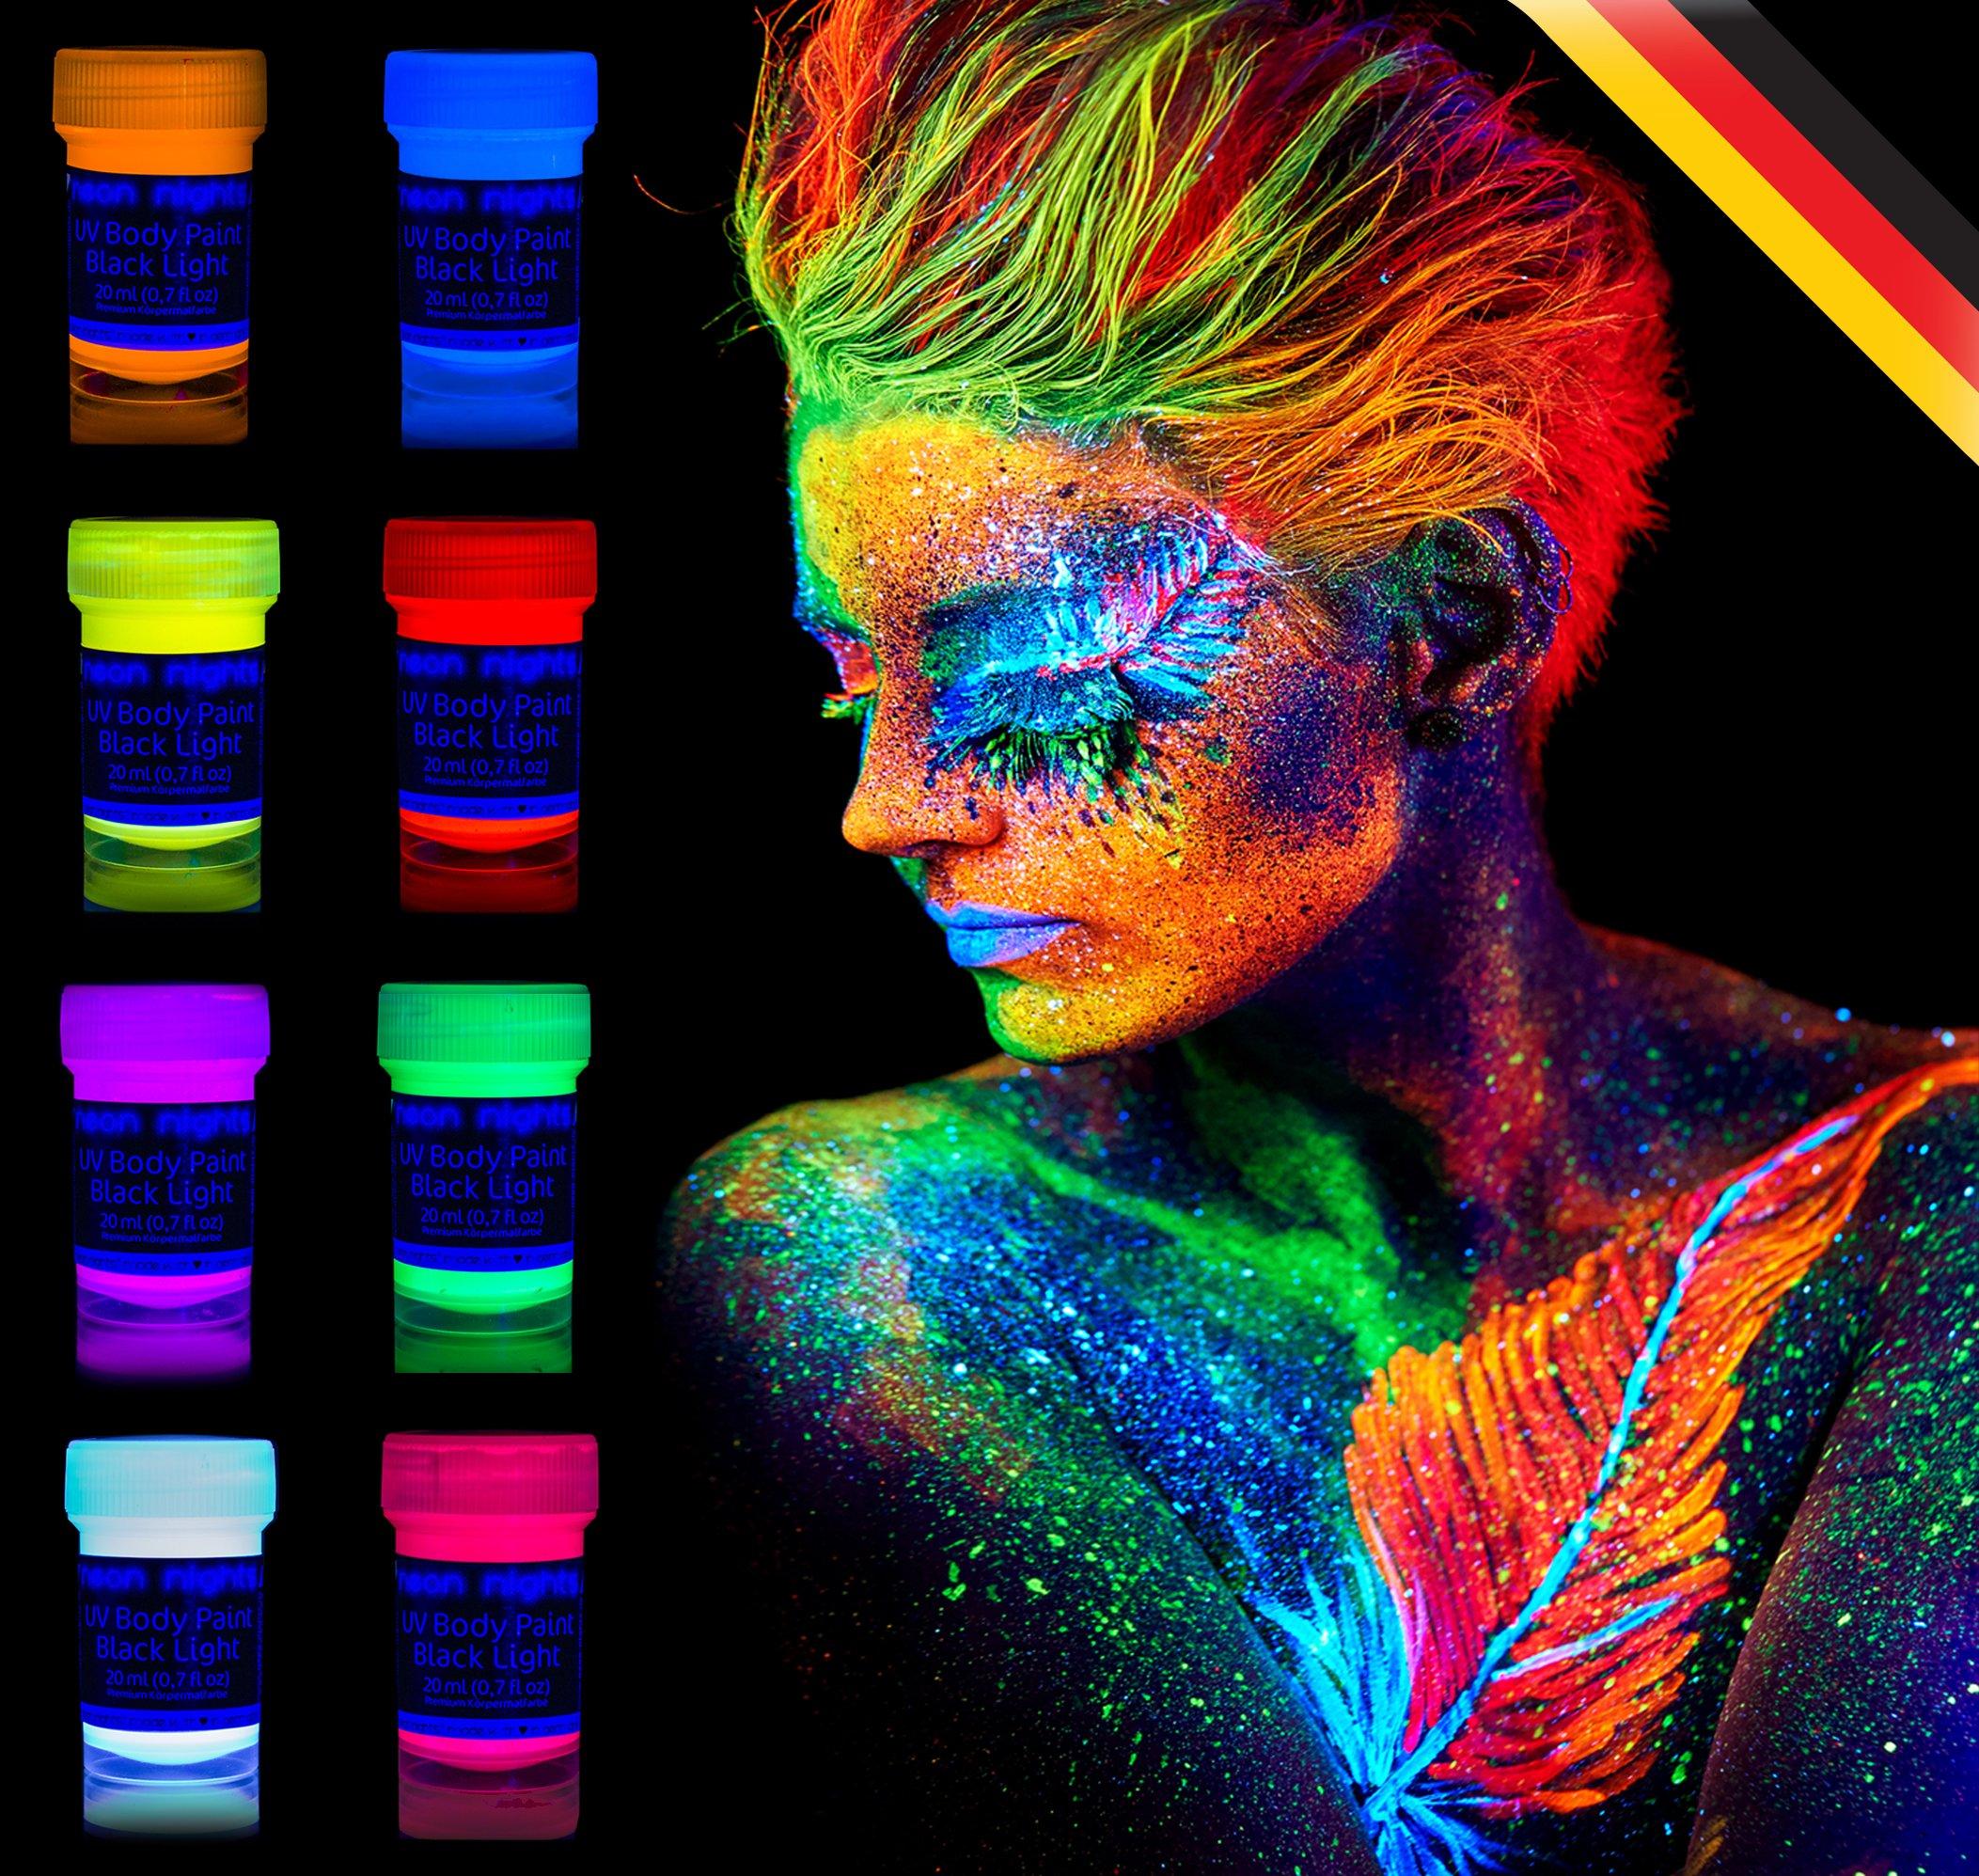 Edible Neon Body Paint